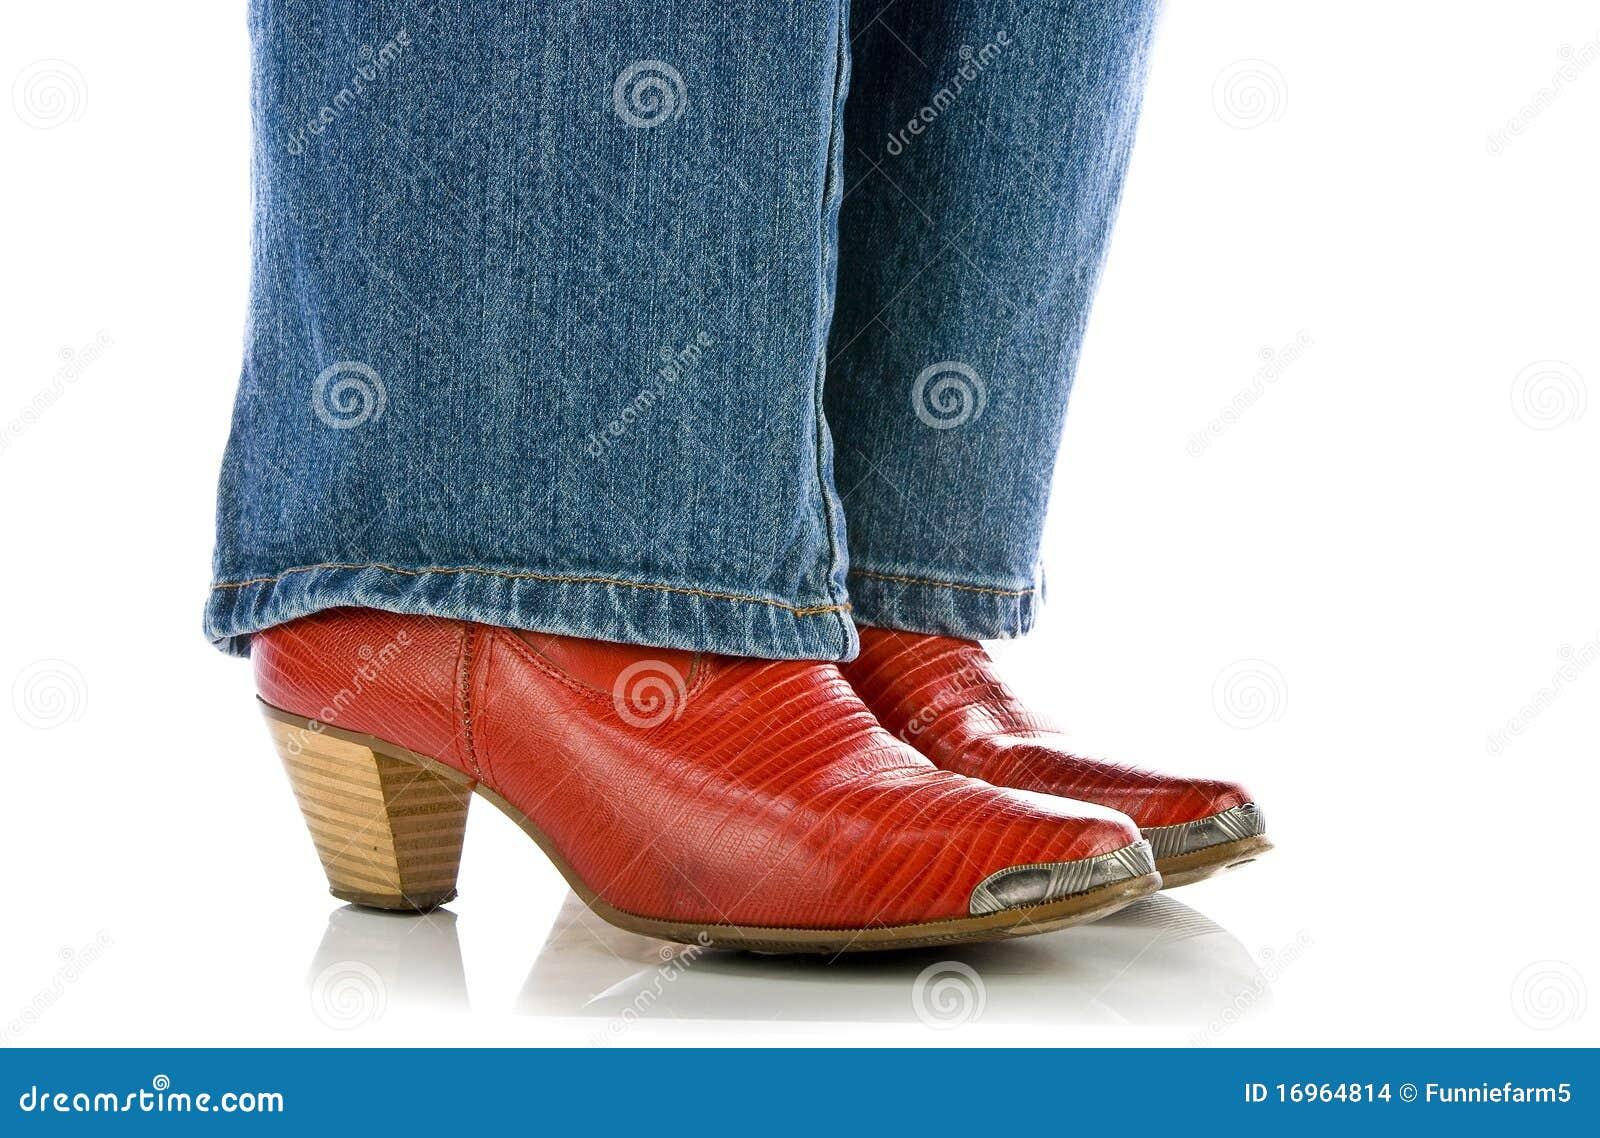 senegal thin isn t considered beautiful skinny women are viewed as